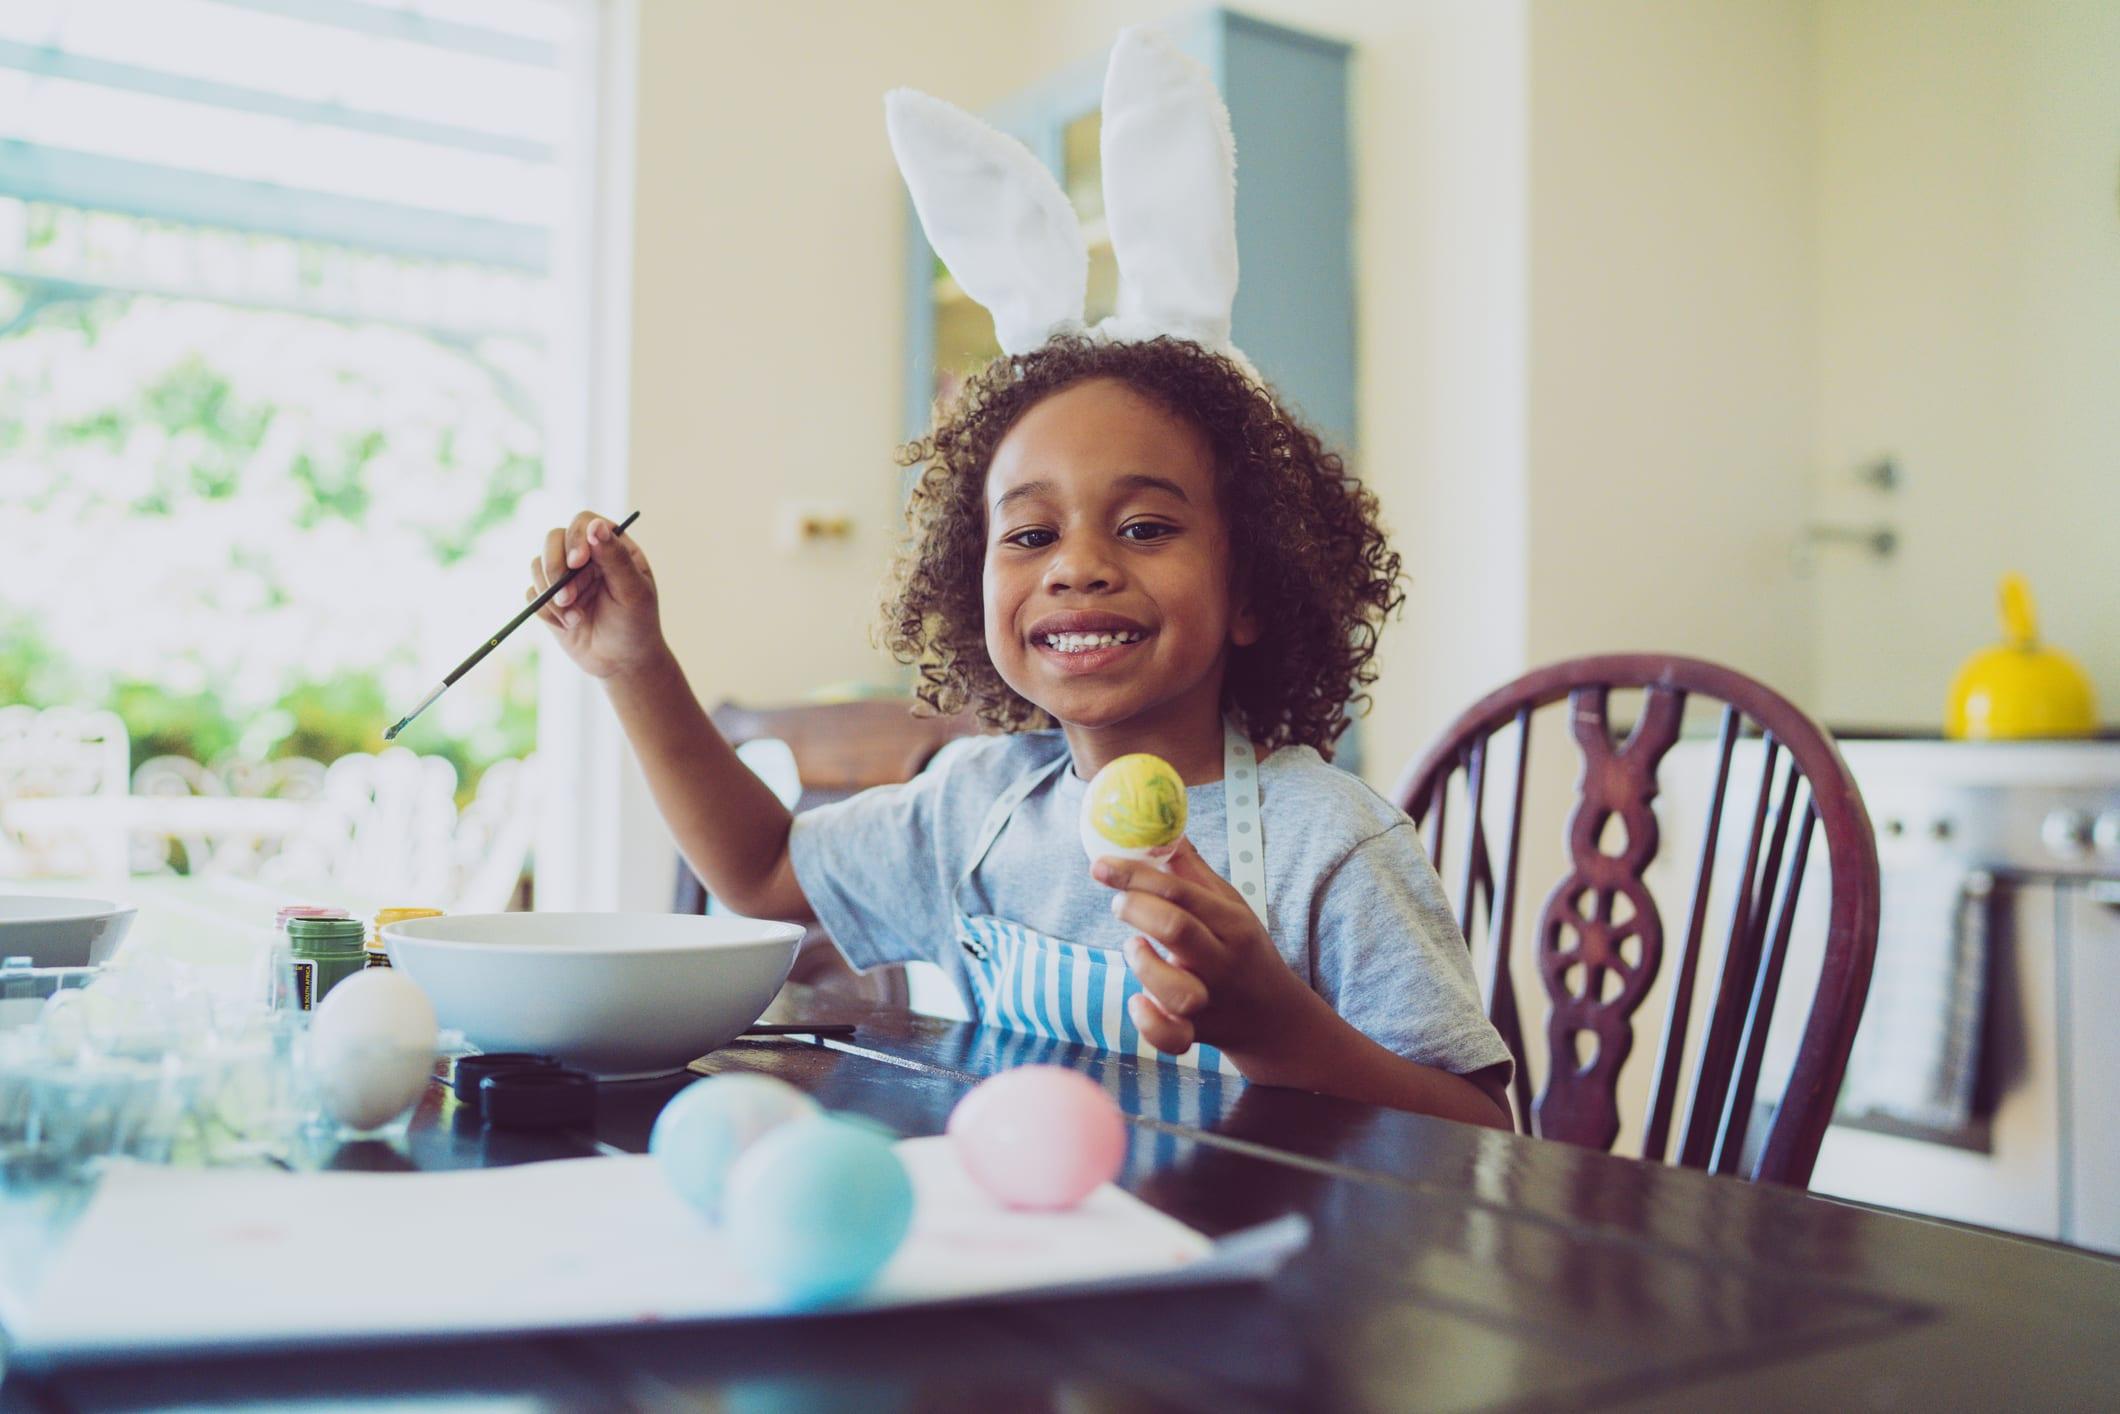 kid dyeing eggs